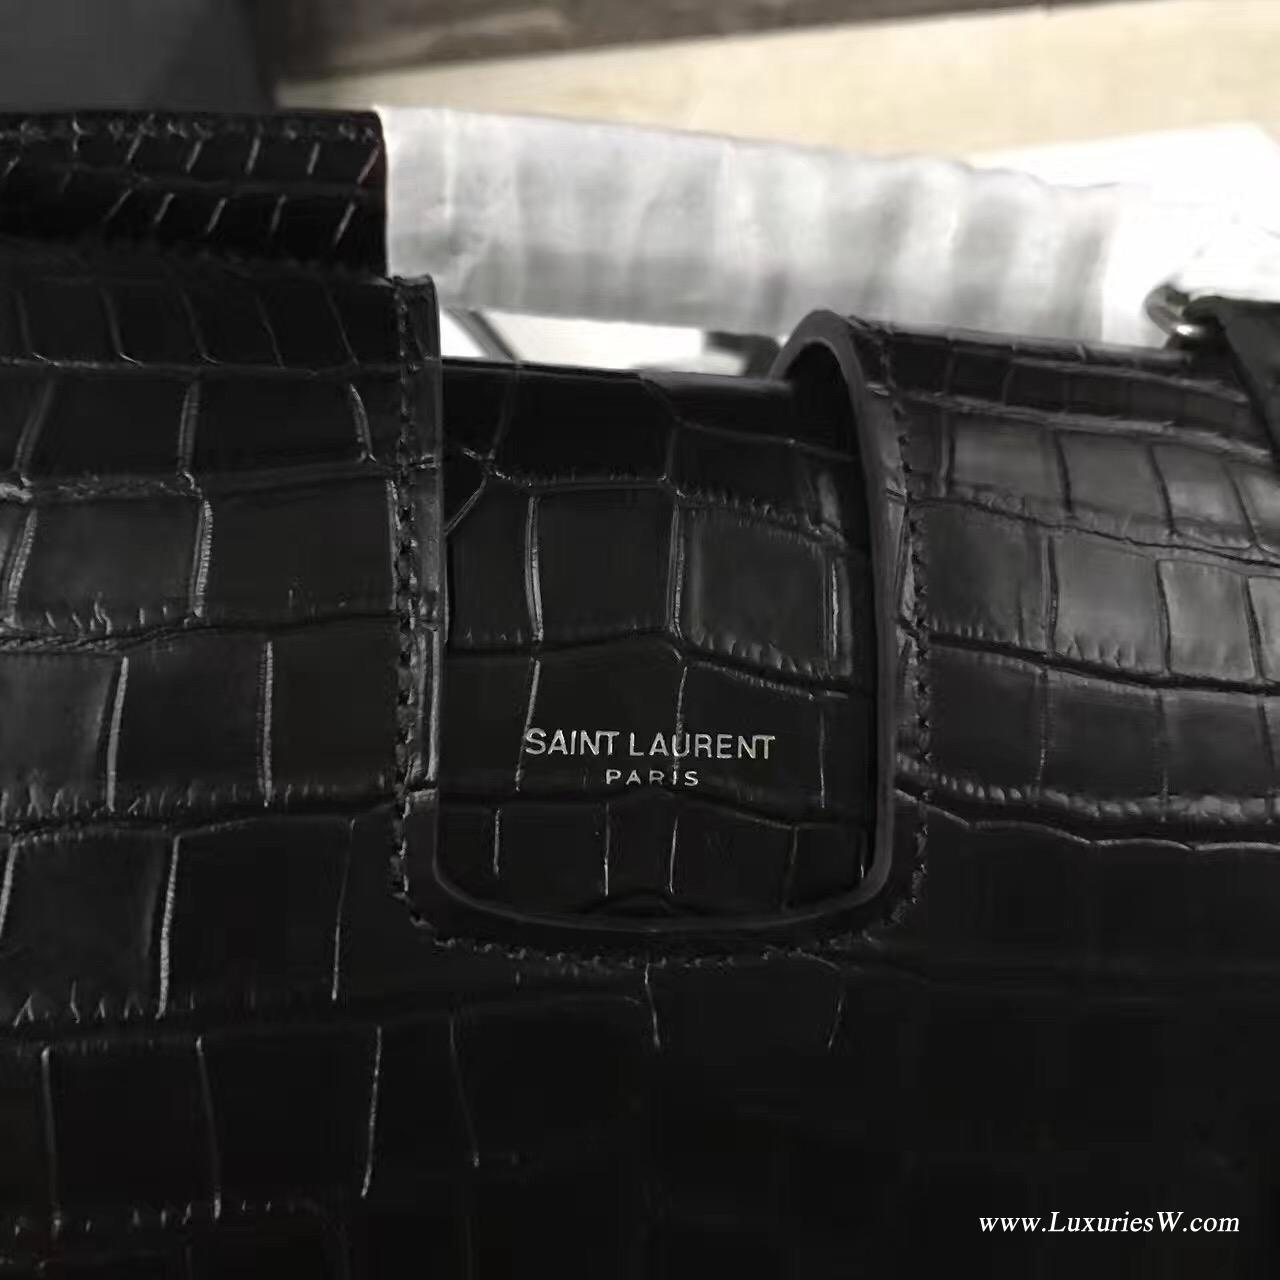 聖羅蘭YSL 大号黑色CHARLOTTE SAINT LAURENT鳄鱼纹斜跨包